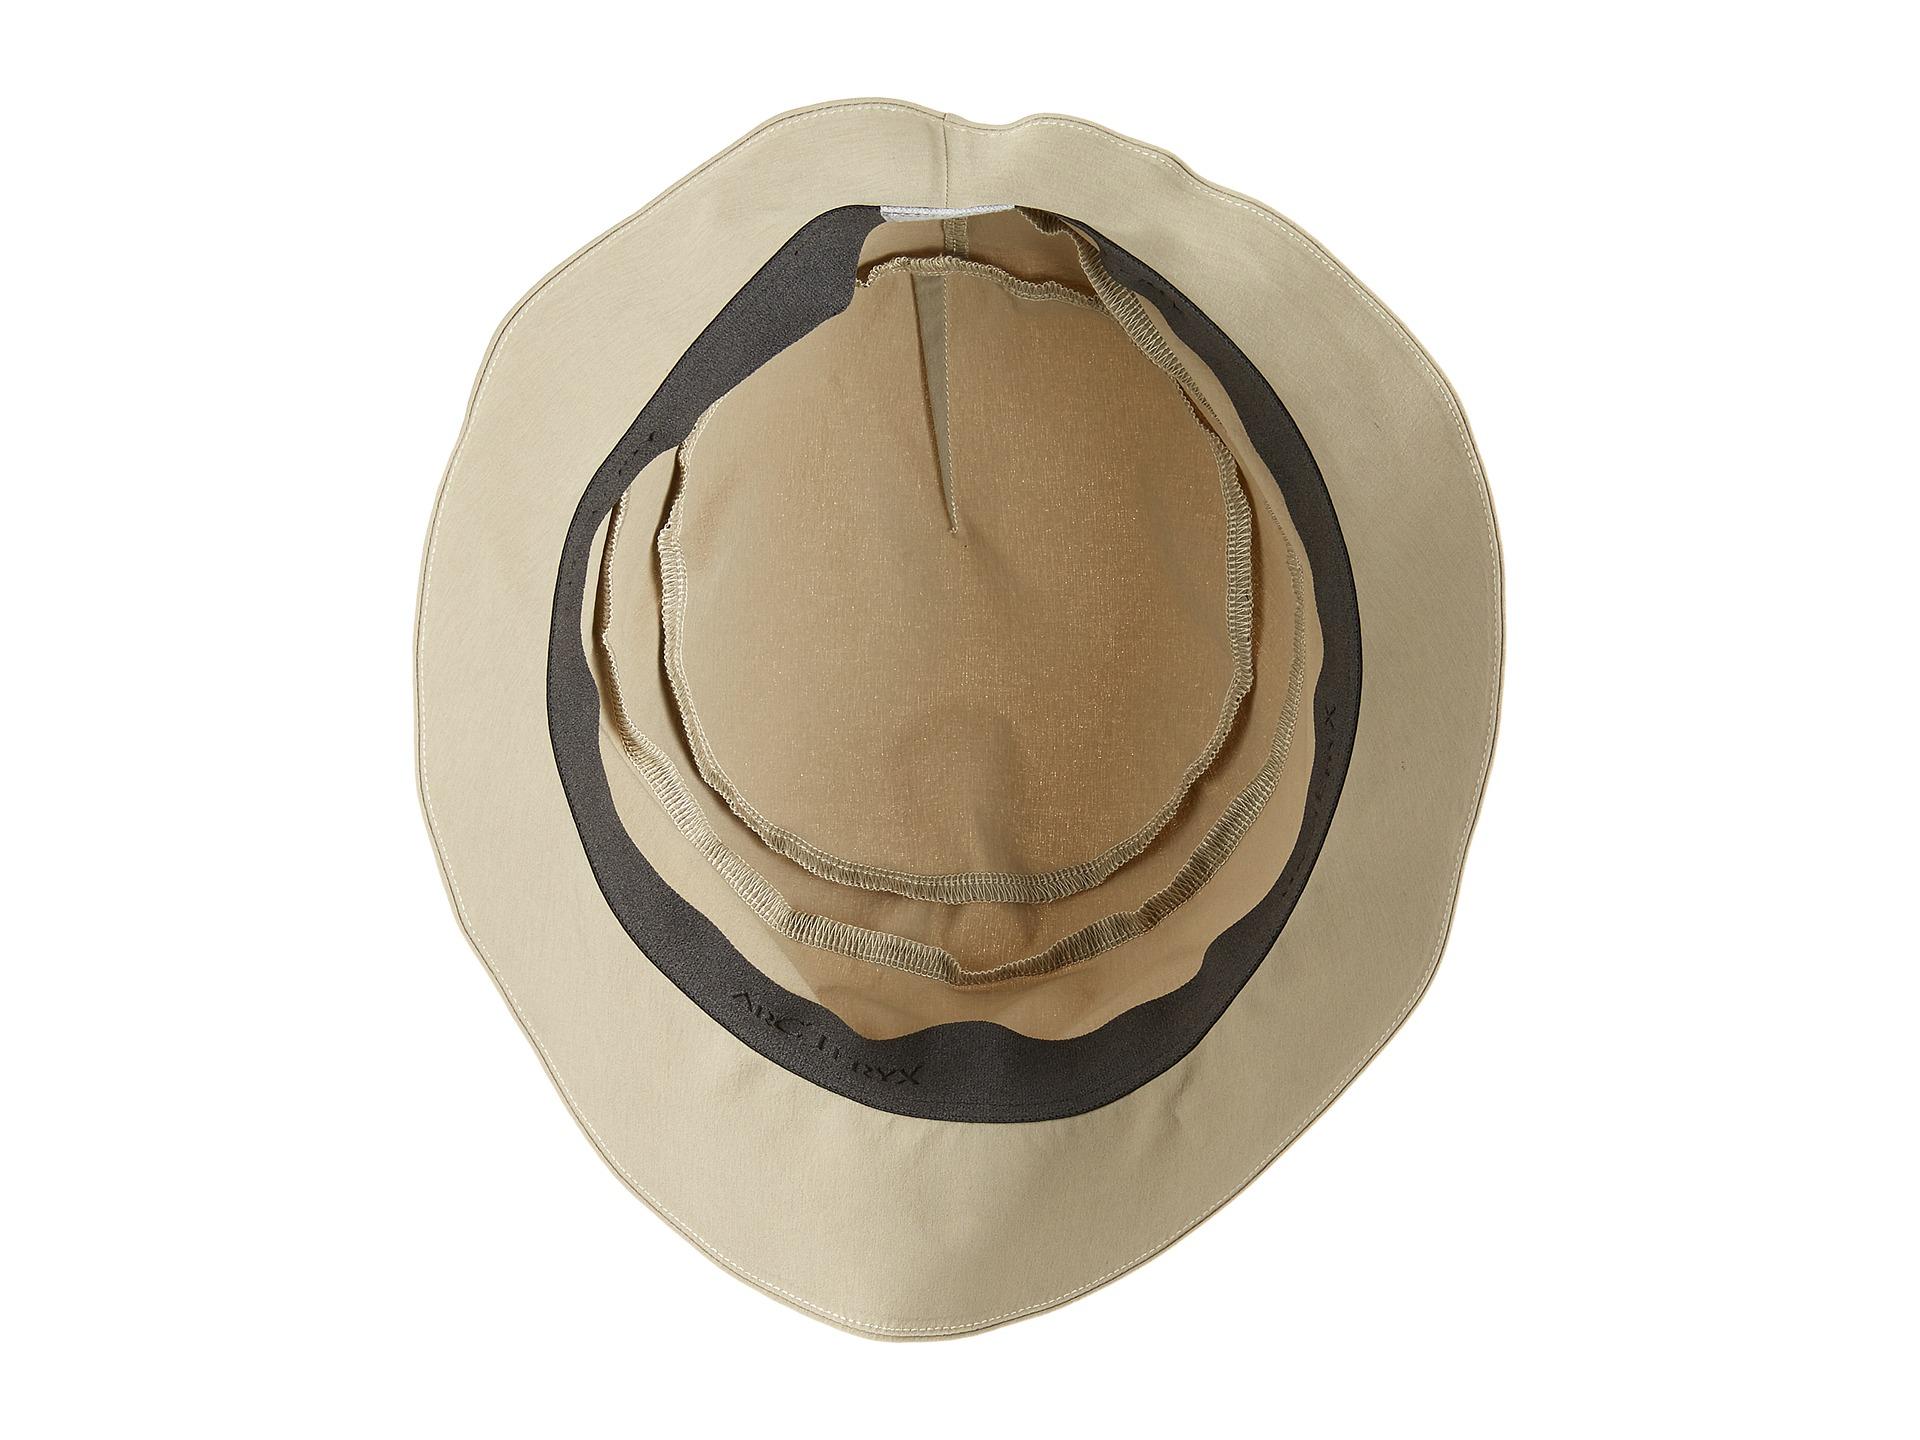 67f85afb849 Lyst - Arc teryx Sinsolo Cap in Gray for Men